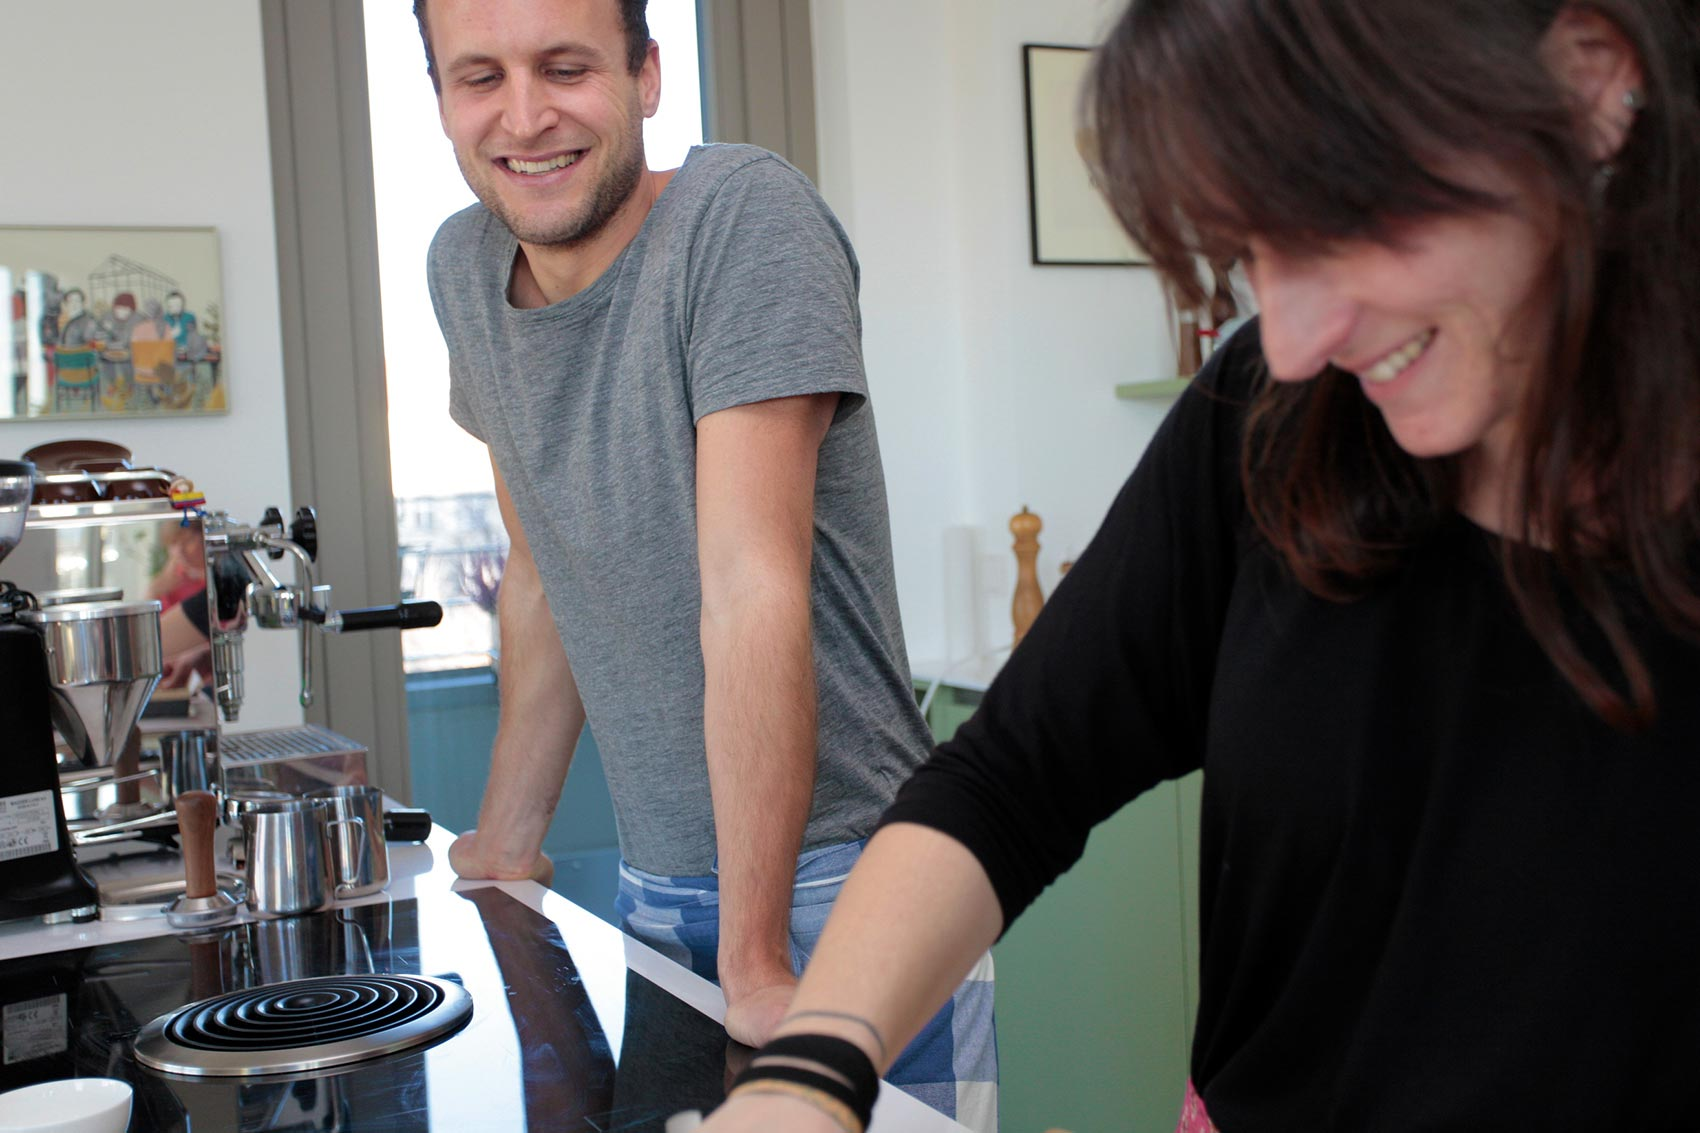 Kaffee Rezept: Coffee Carbonara Tagliatelle. CafCaf.de – Kaffee & Blog, Kaffeeblog